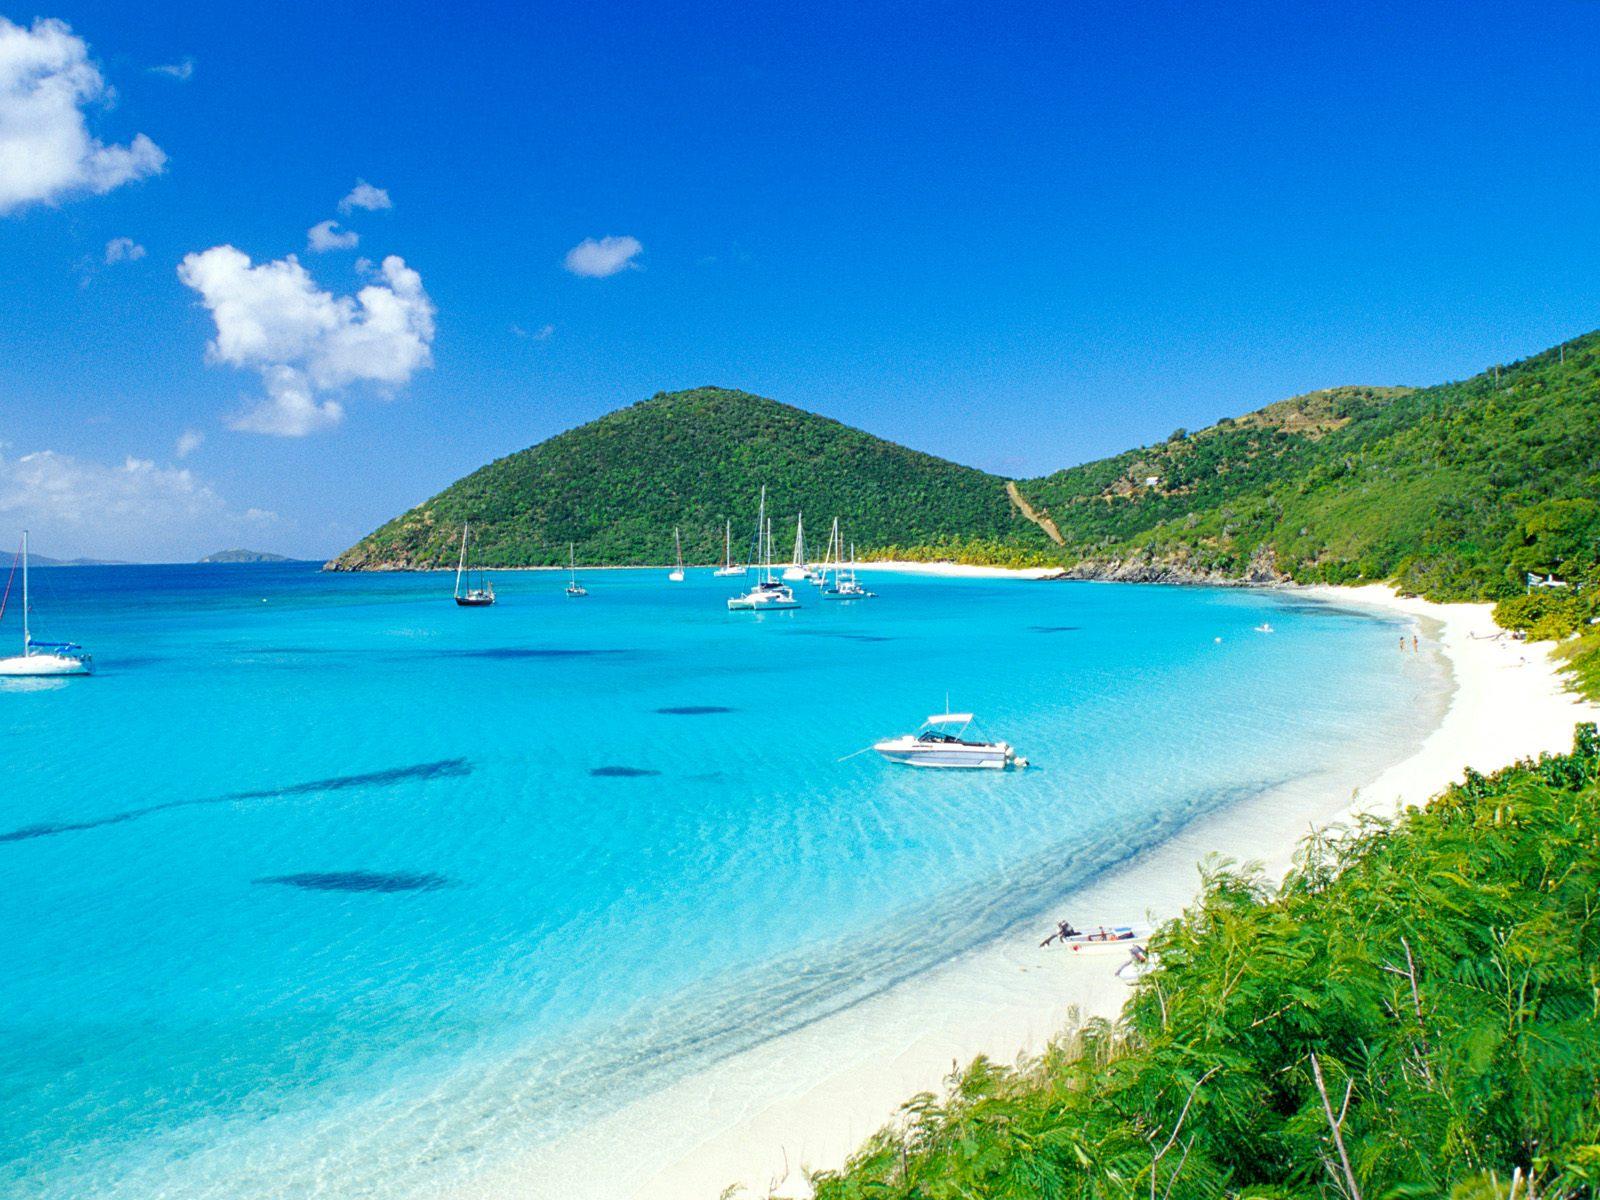 Carribean Beach Hotel St Thomas Virgin Islands